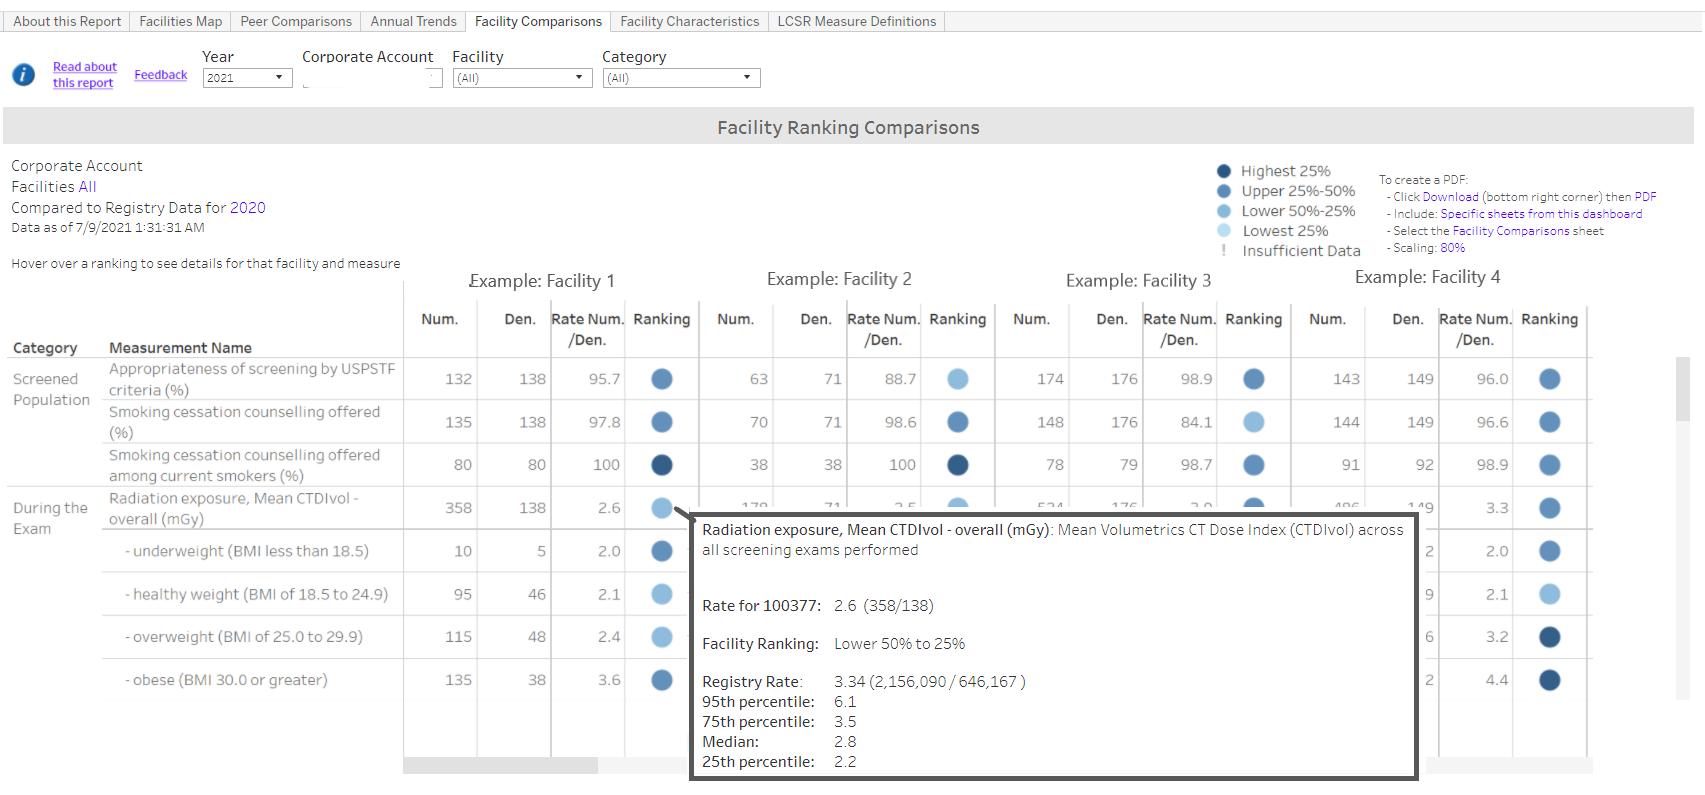 LCSR Facility Comparisons Tab